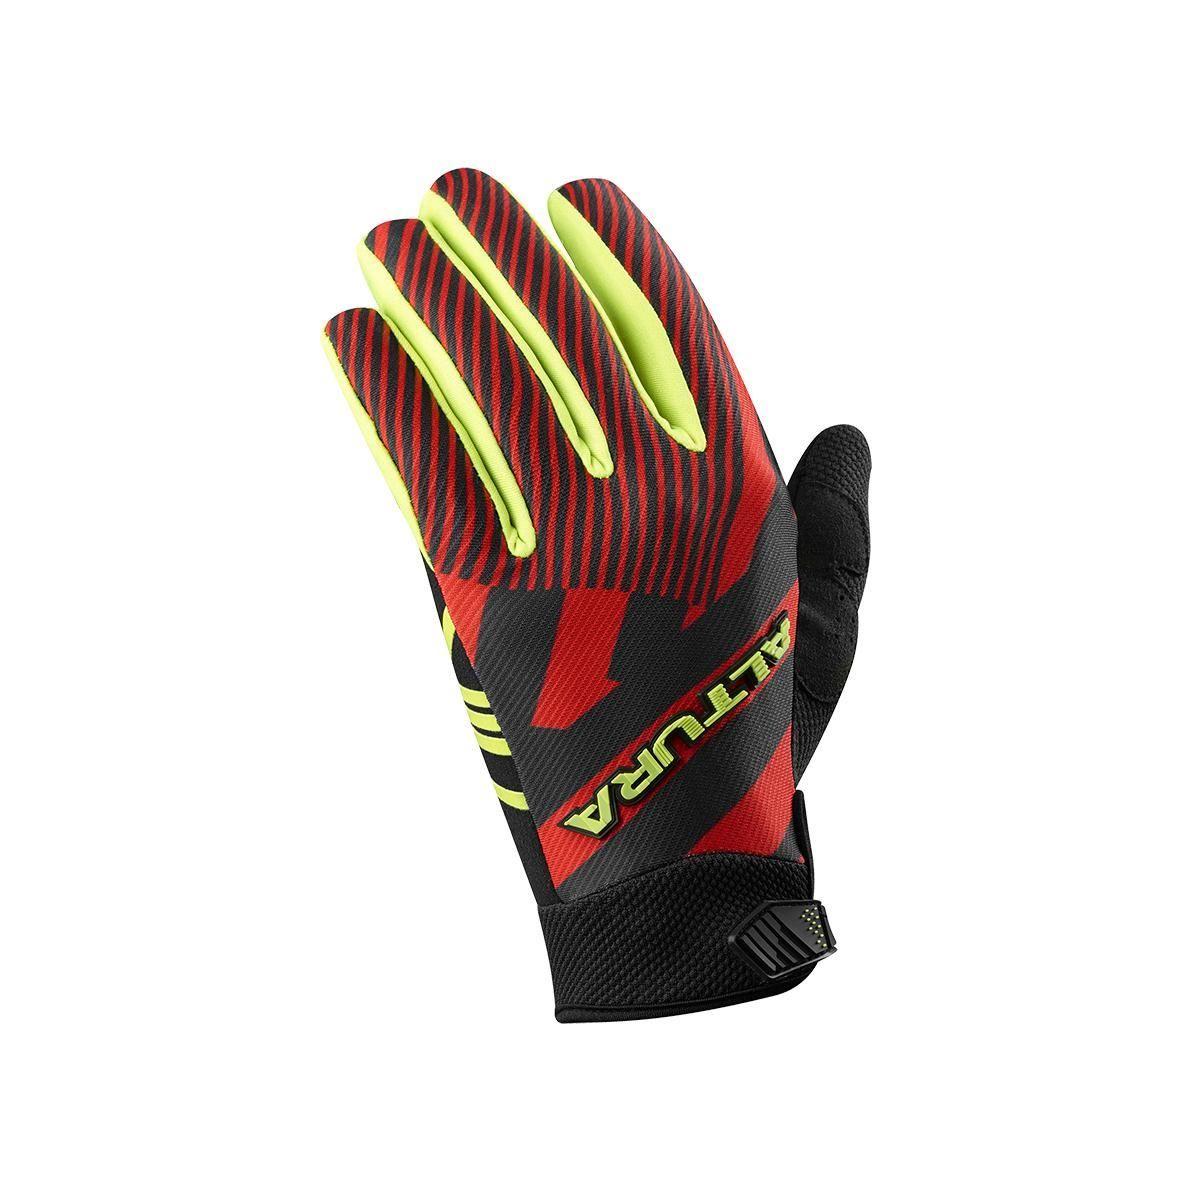 Altura Three 60 (360) G2 Gloves: Red/Black Xl